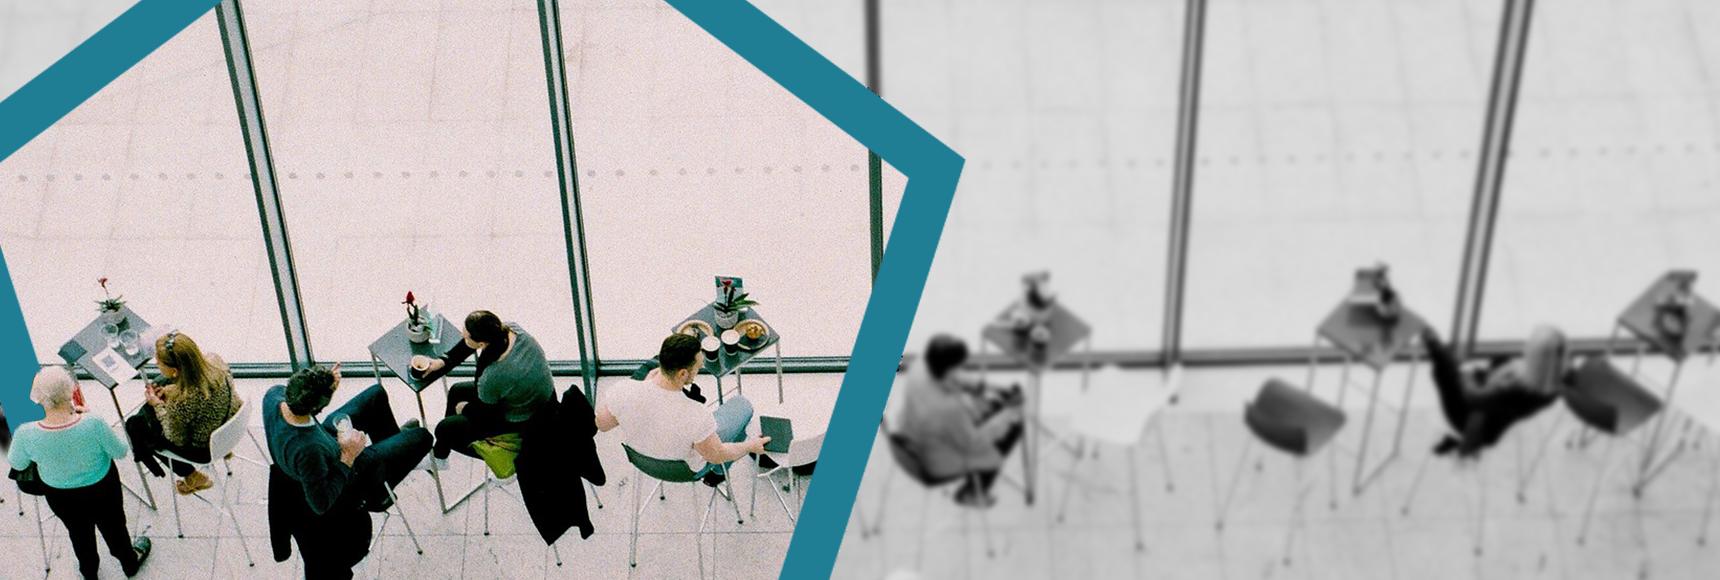 Agencia social media Madrid - Concepto 05